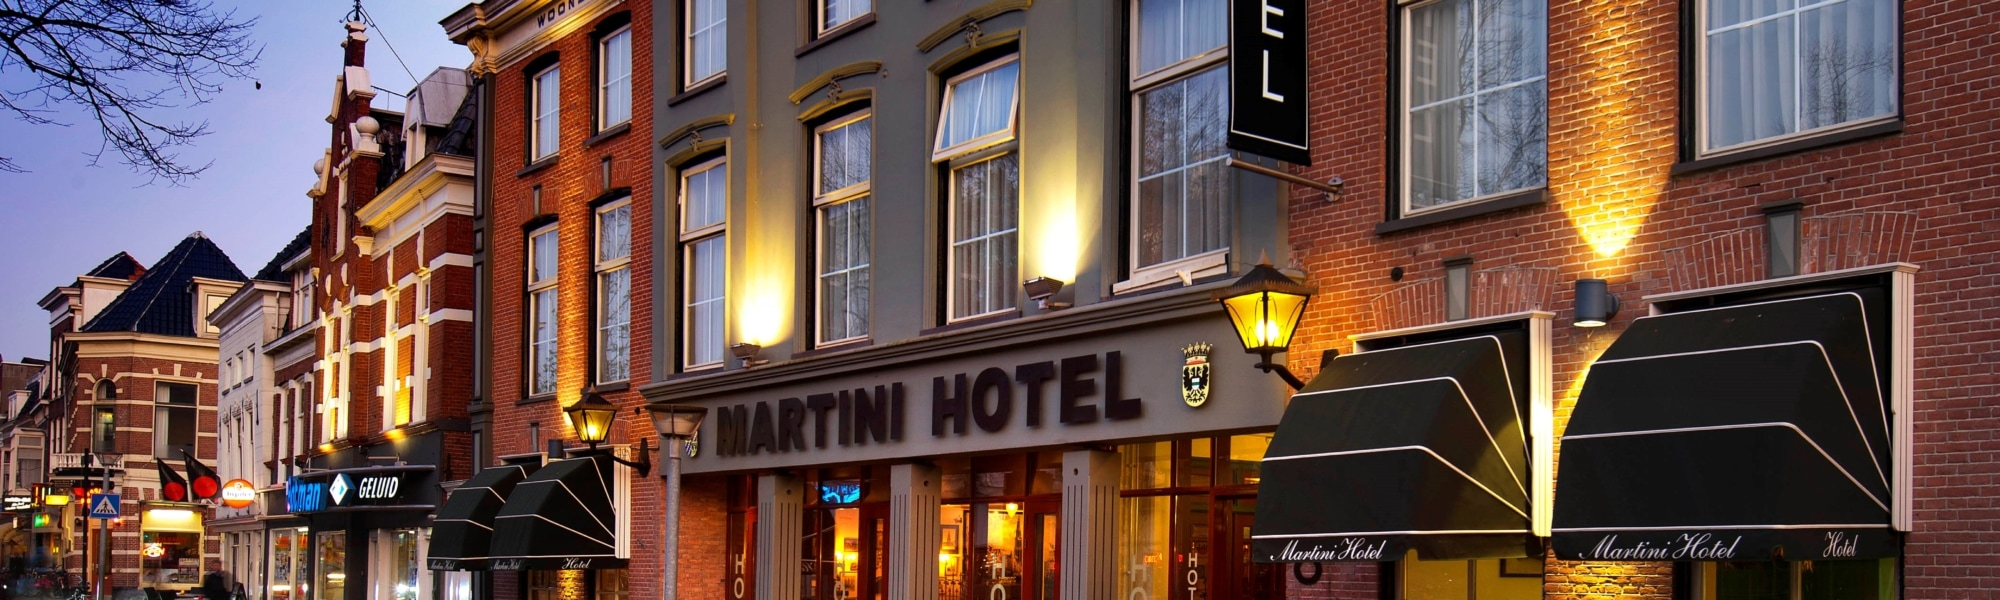 Foto's Martini Hotel oktober 2019 (43)